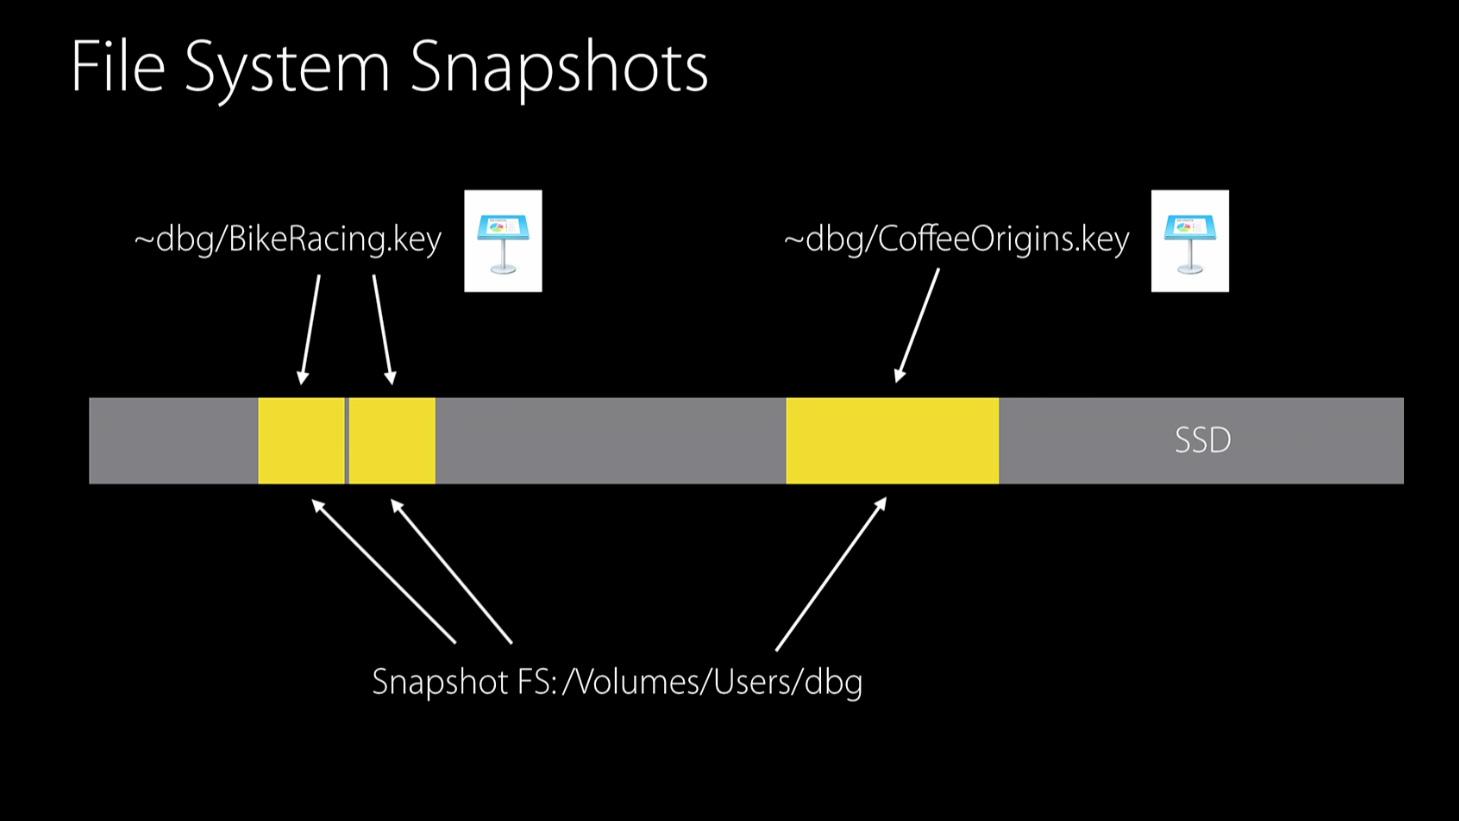 APFS_file_system_snapshot.jpg